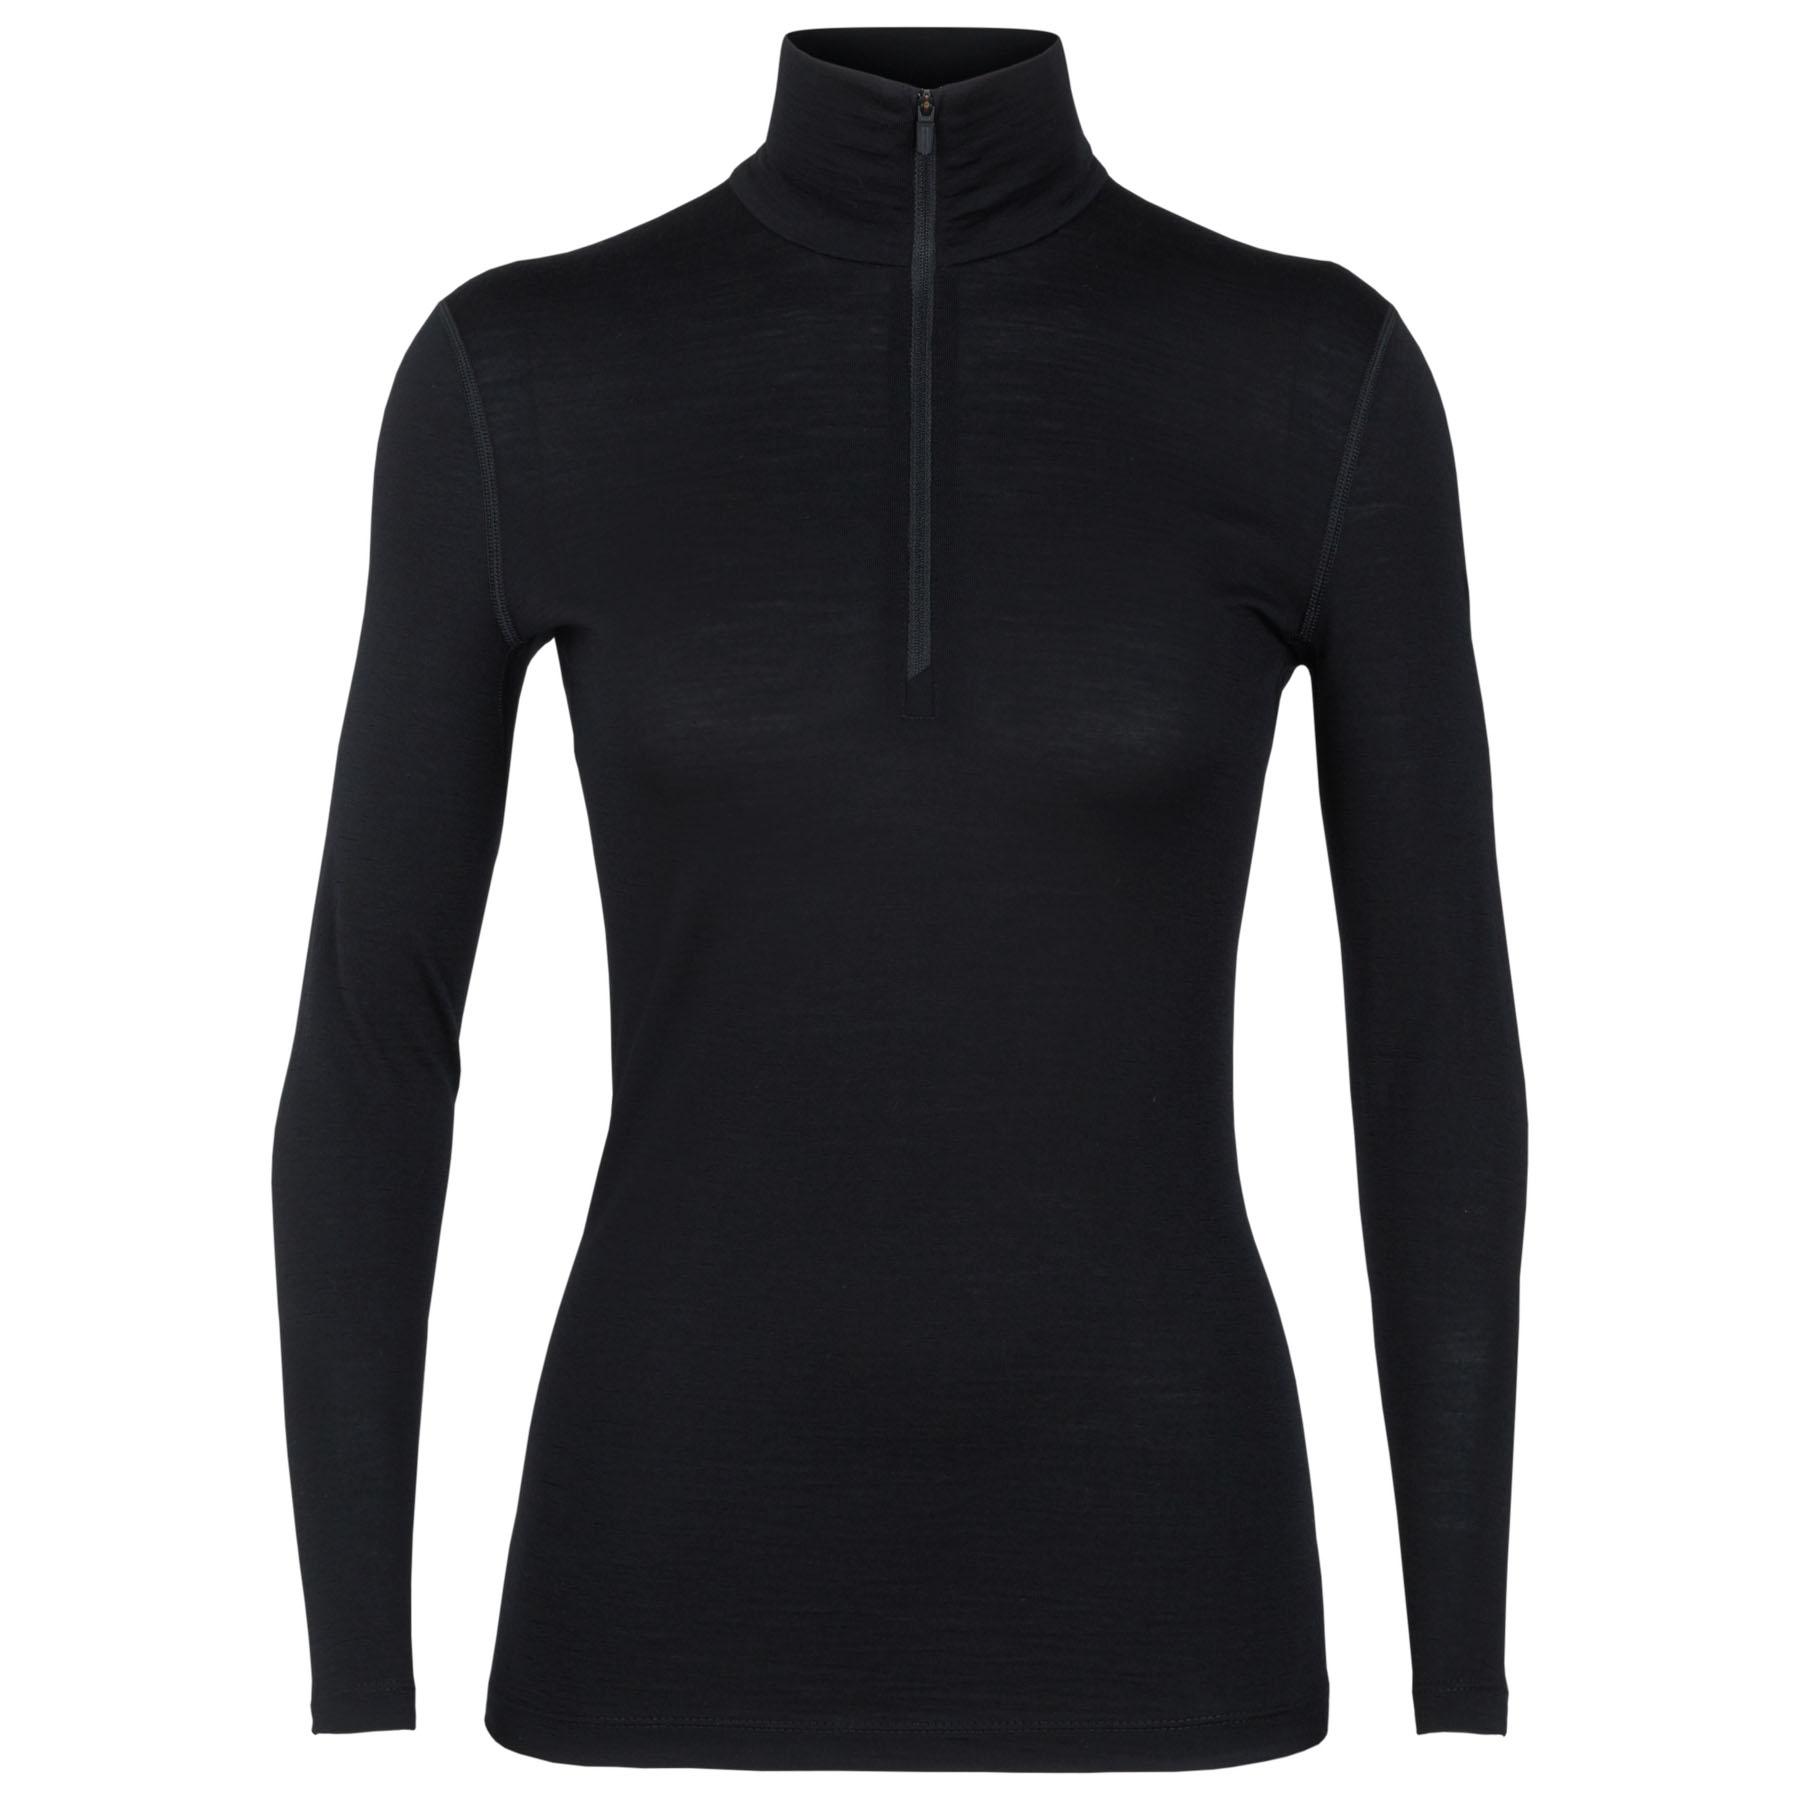 Produktbild von Icebreaker 200 Oasis Half Zip Damen Langarmshirt - Black